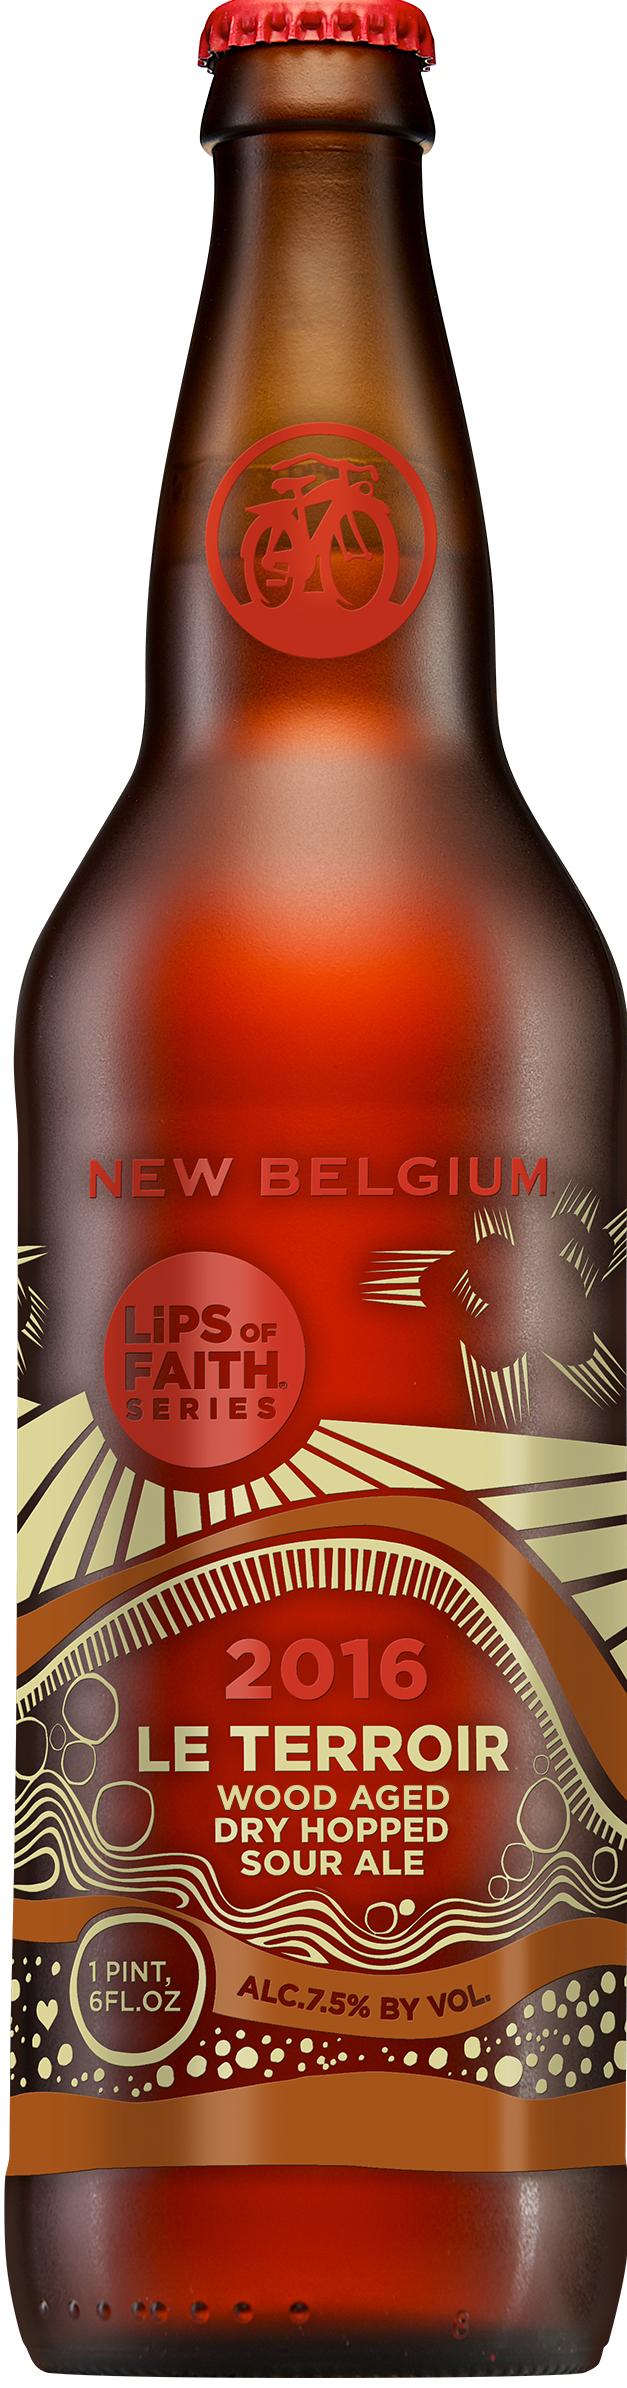 © New Belgium Brewing